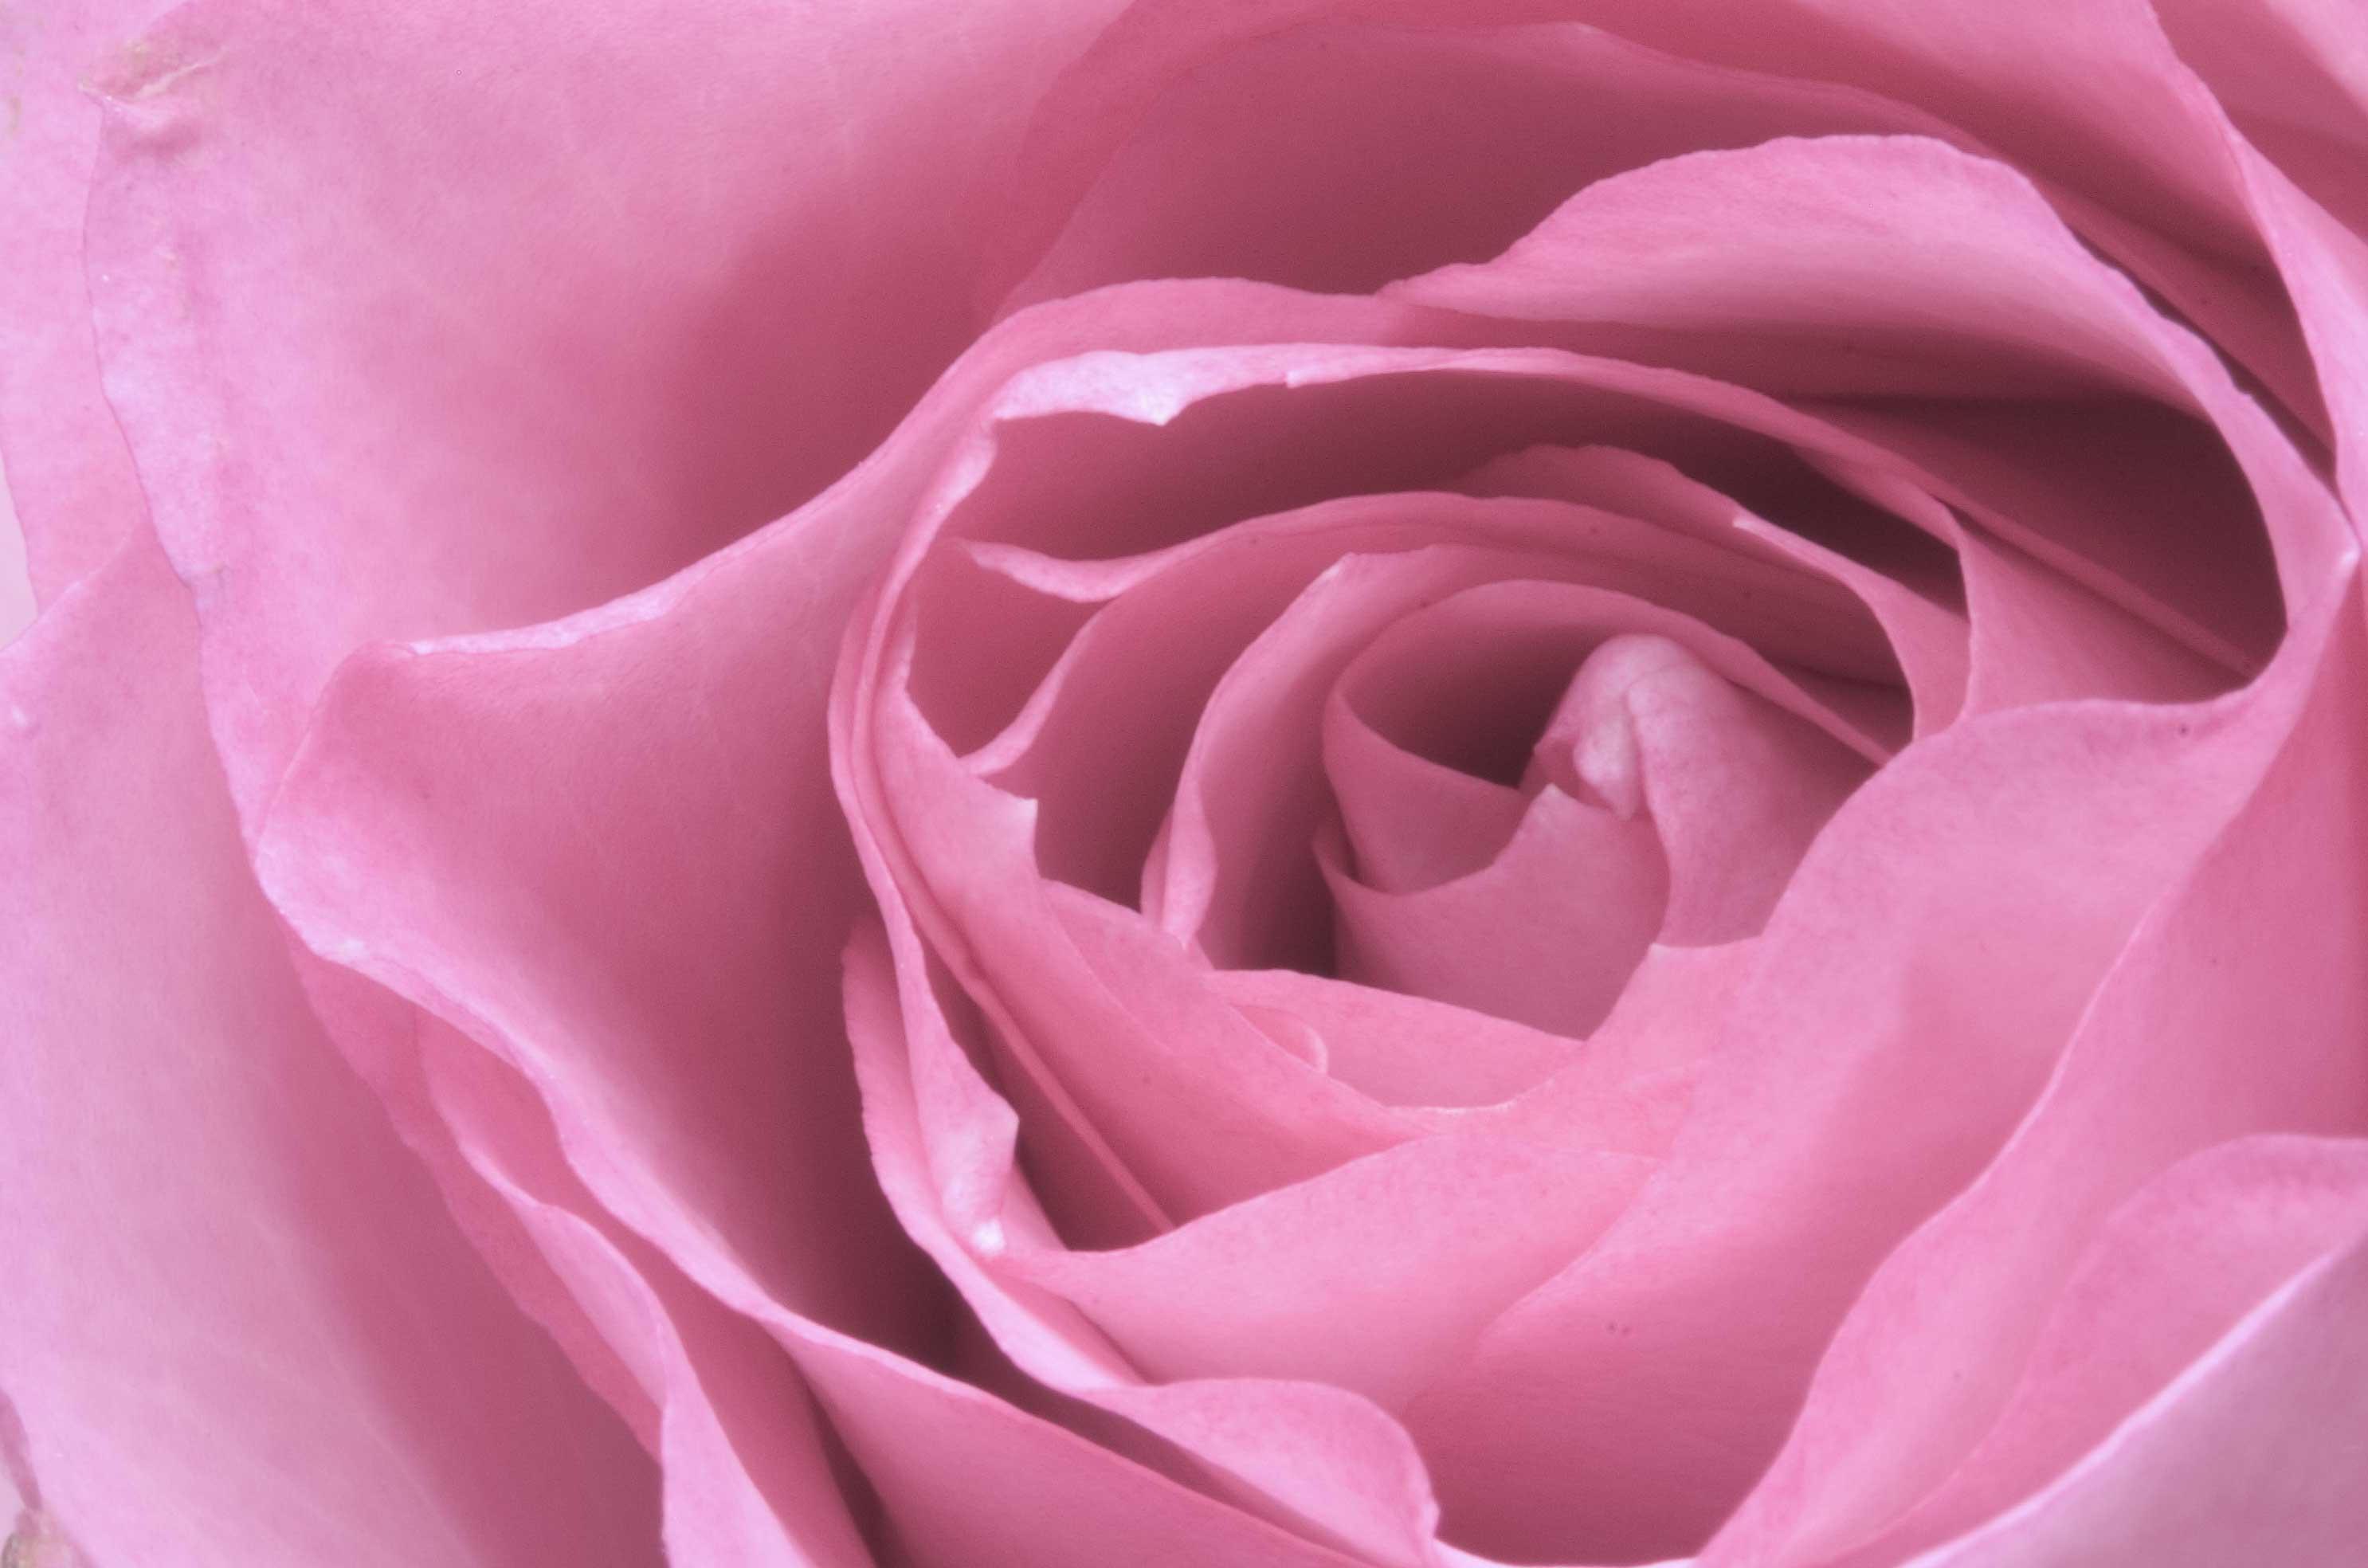 Rose by Carlosfandango